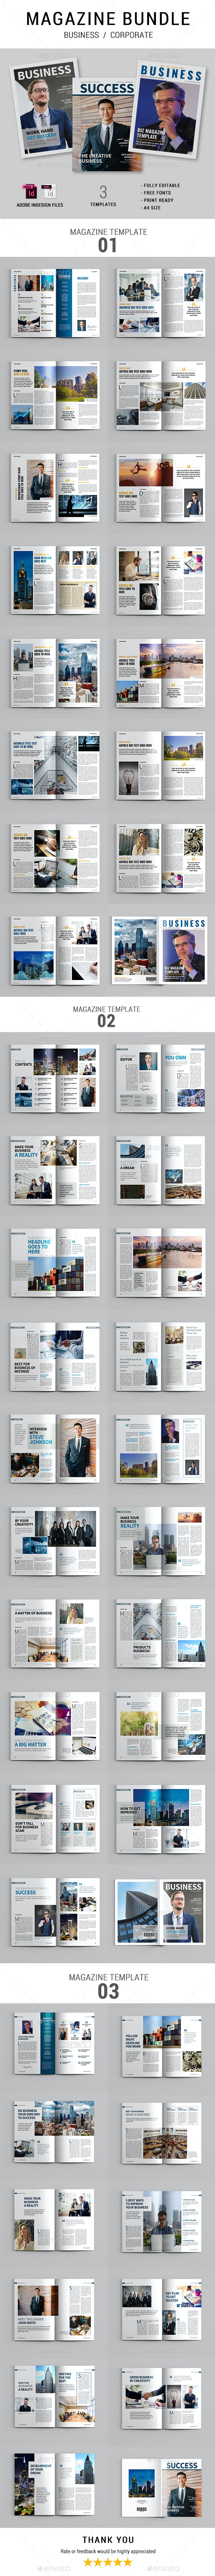 Business Magazine Bundle - Magazines Print Templates